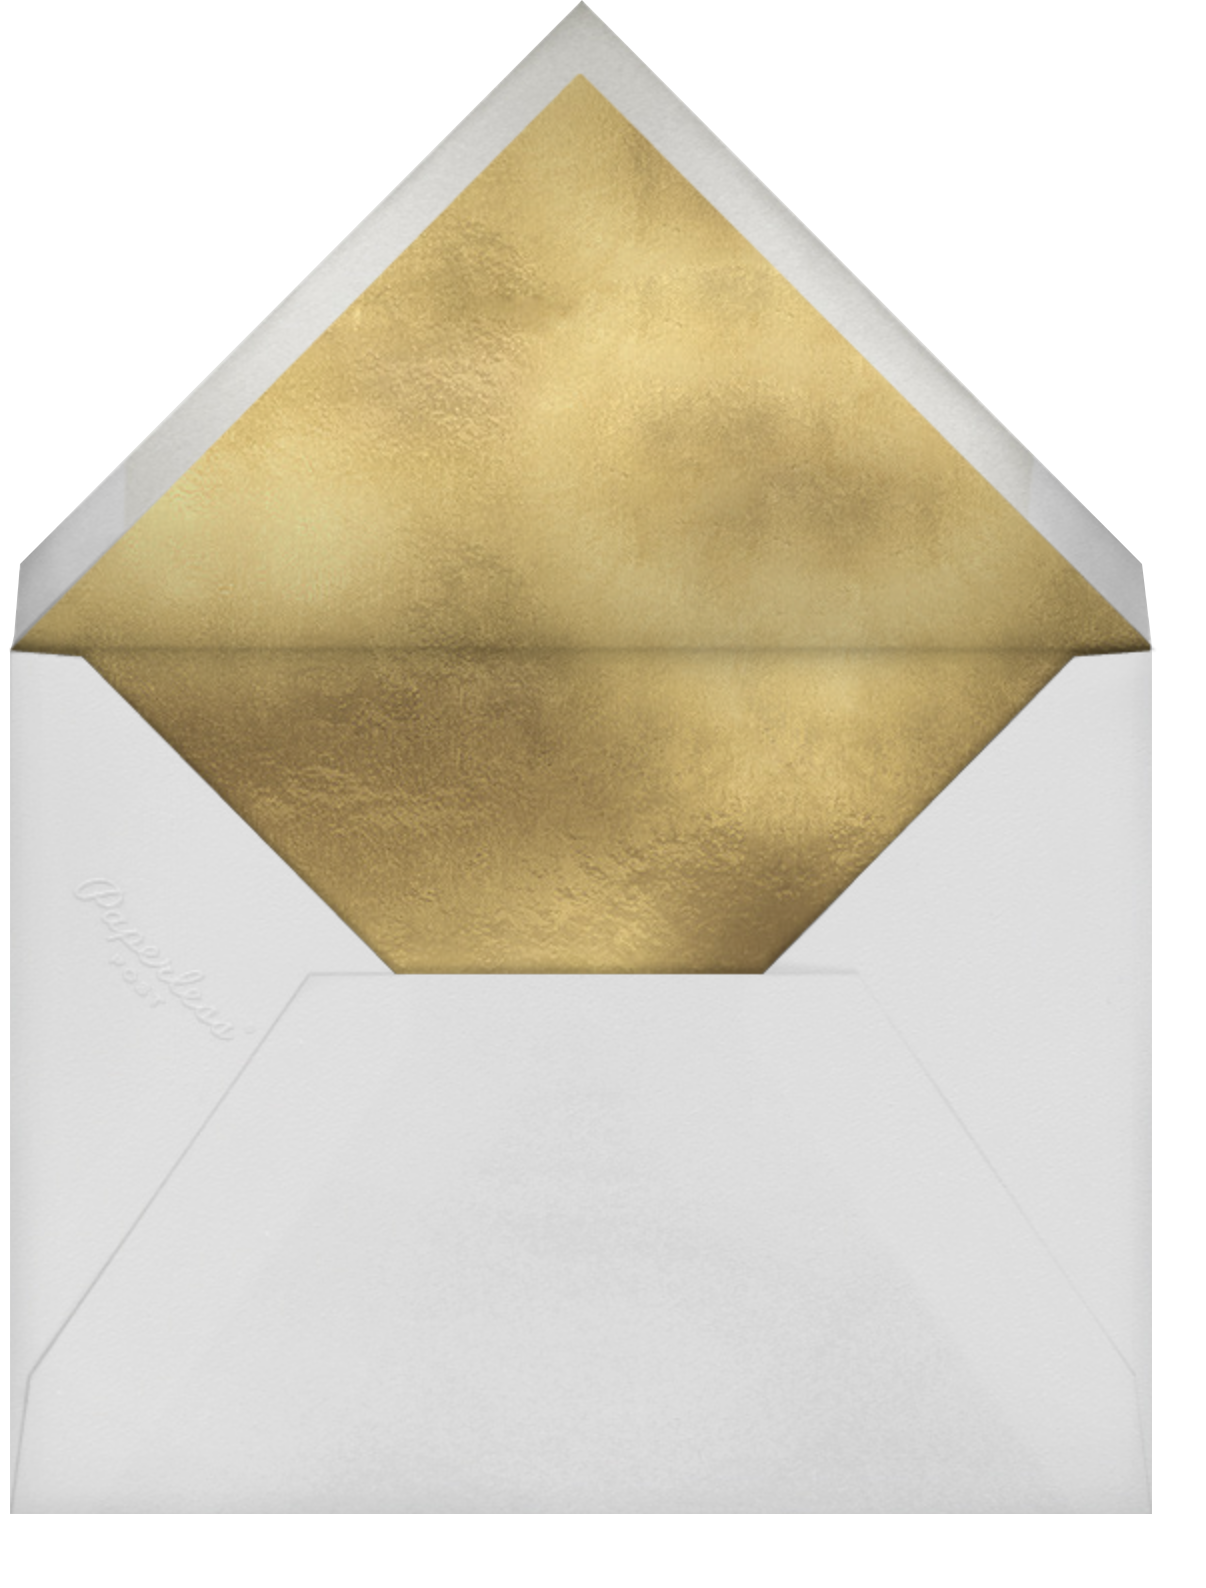 Enter Our Destination - Paperless Post - Destination - envelope back